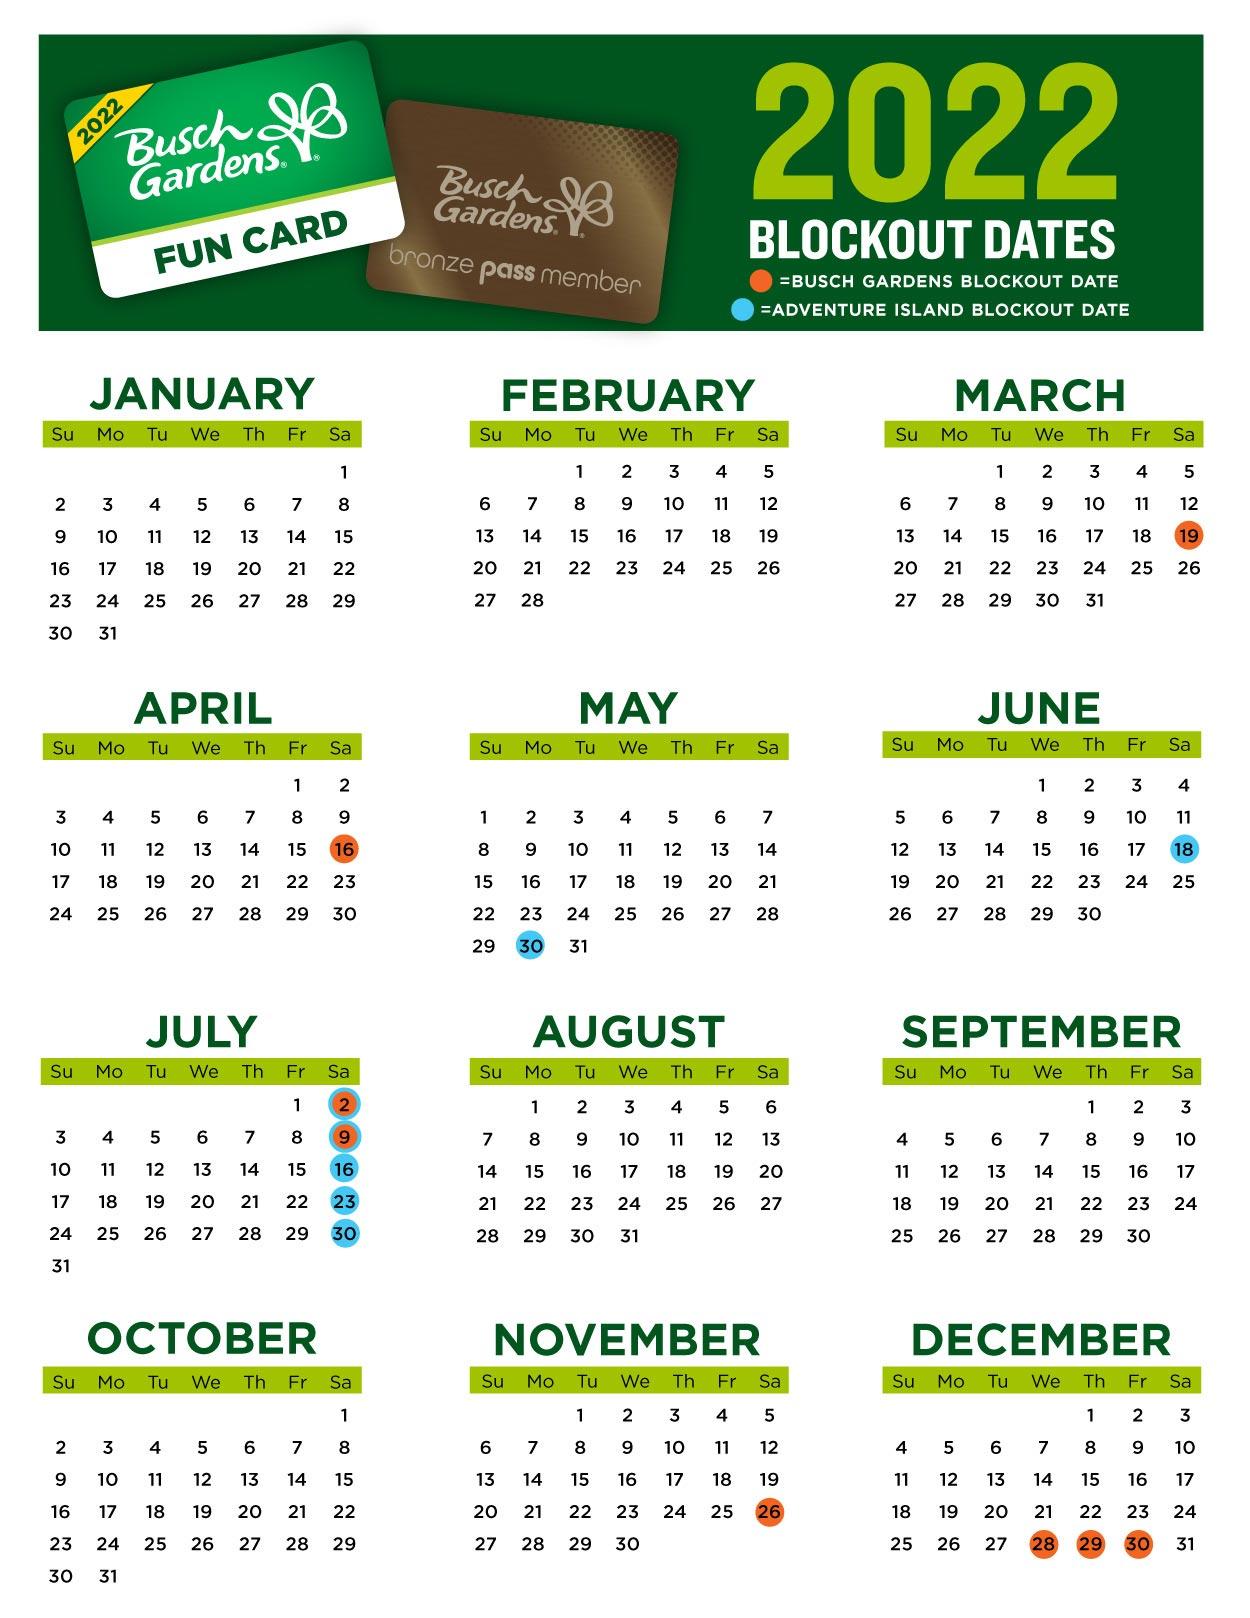 2022 Busch Gardens Tampa Bay Fun Card Blockout Dates